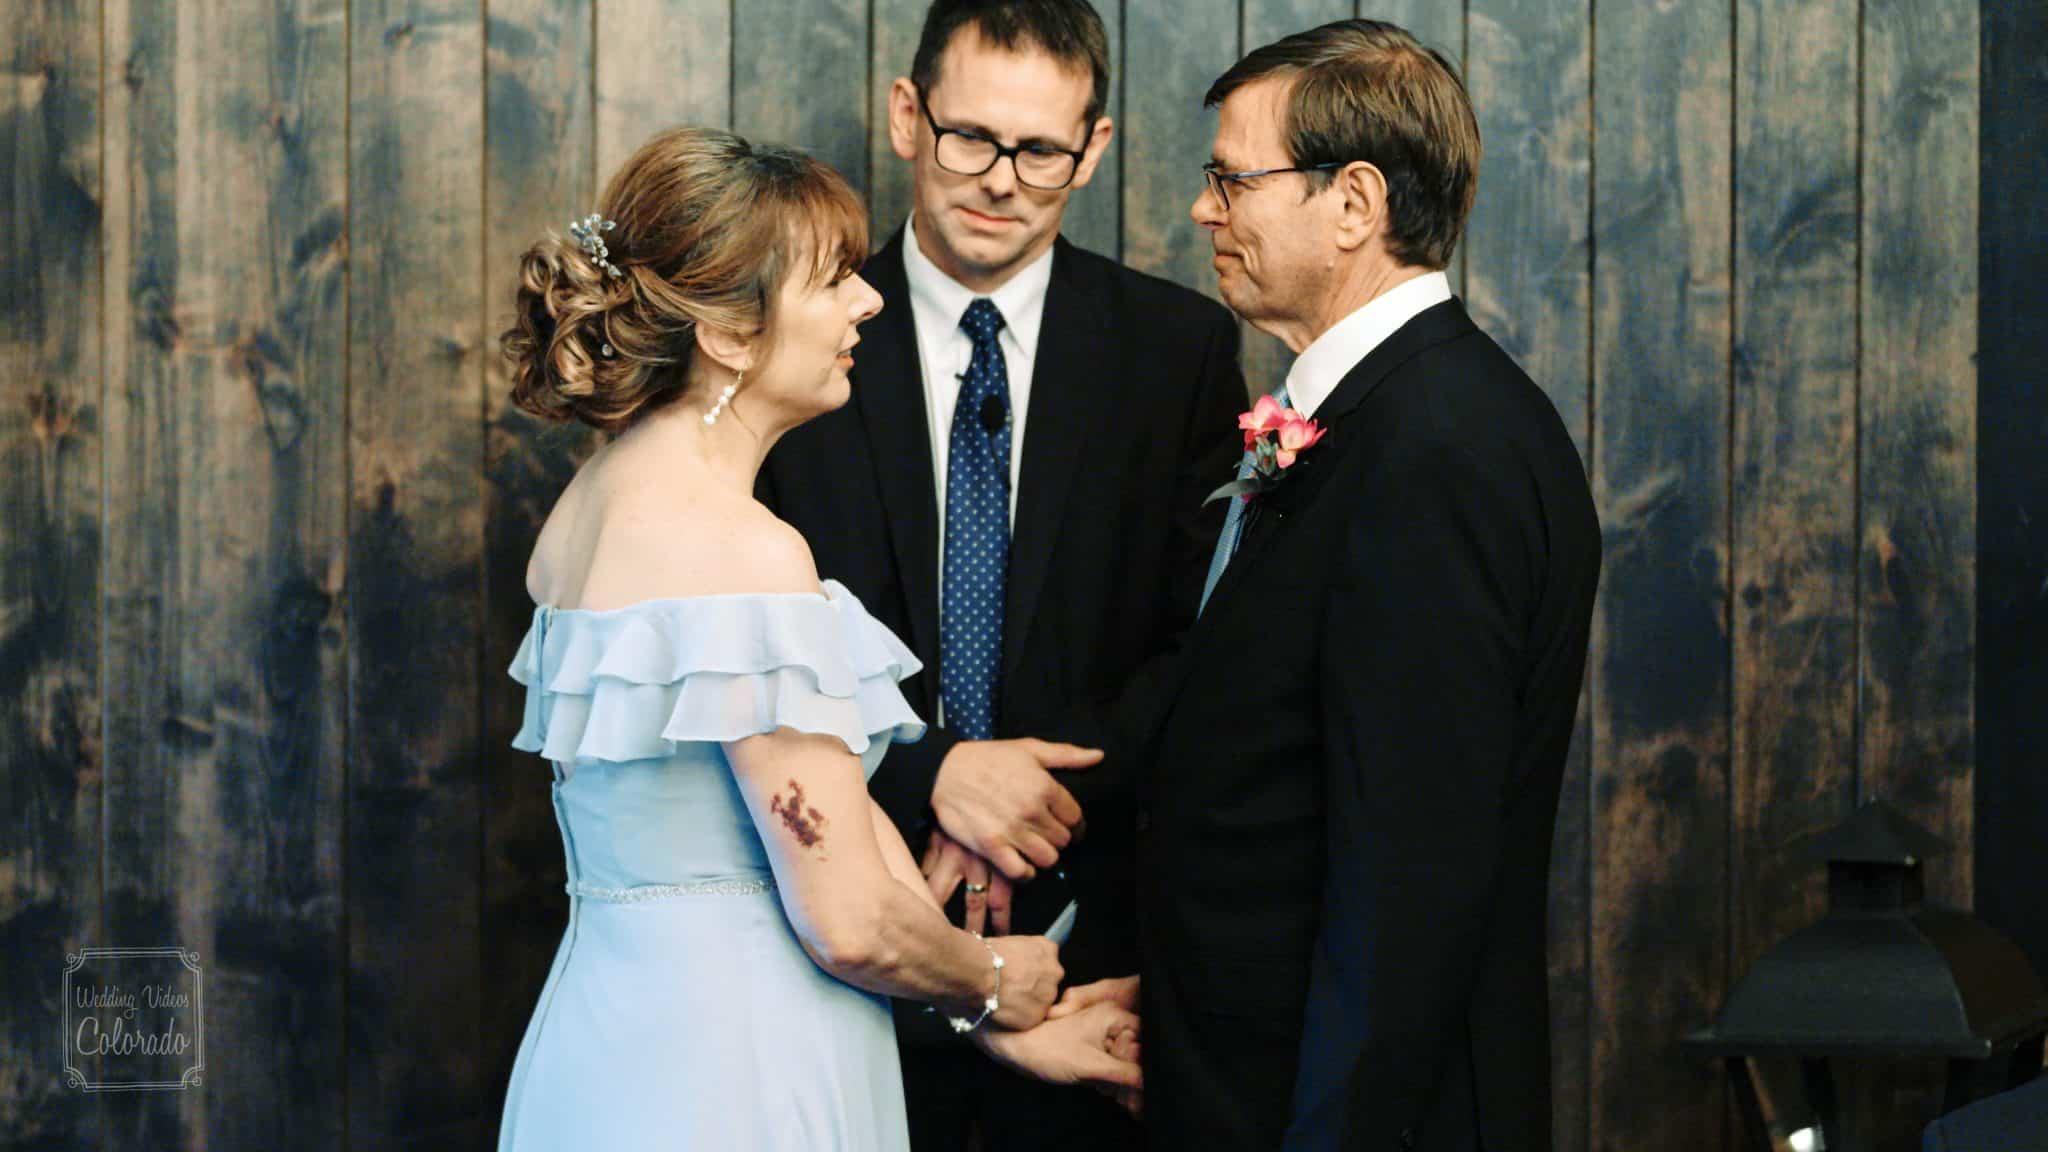 Randy & Helen Fort Collins ginger & baker wedding video